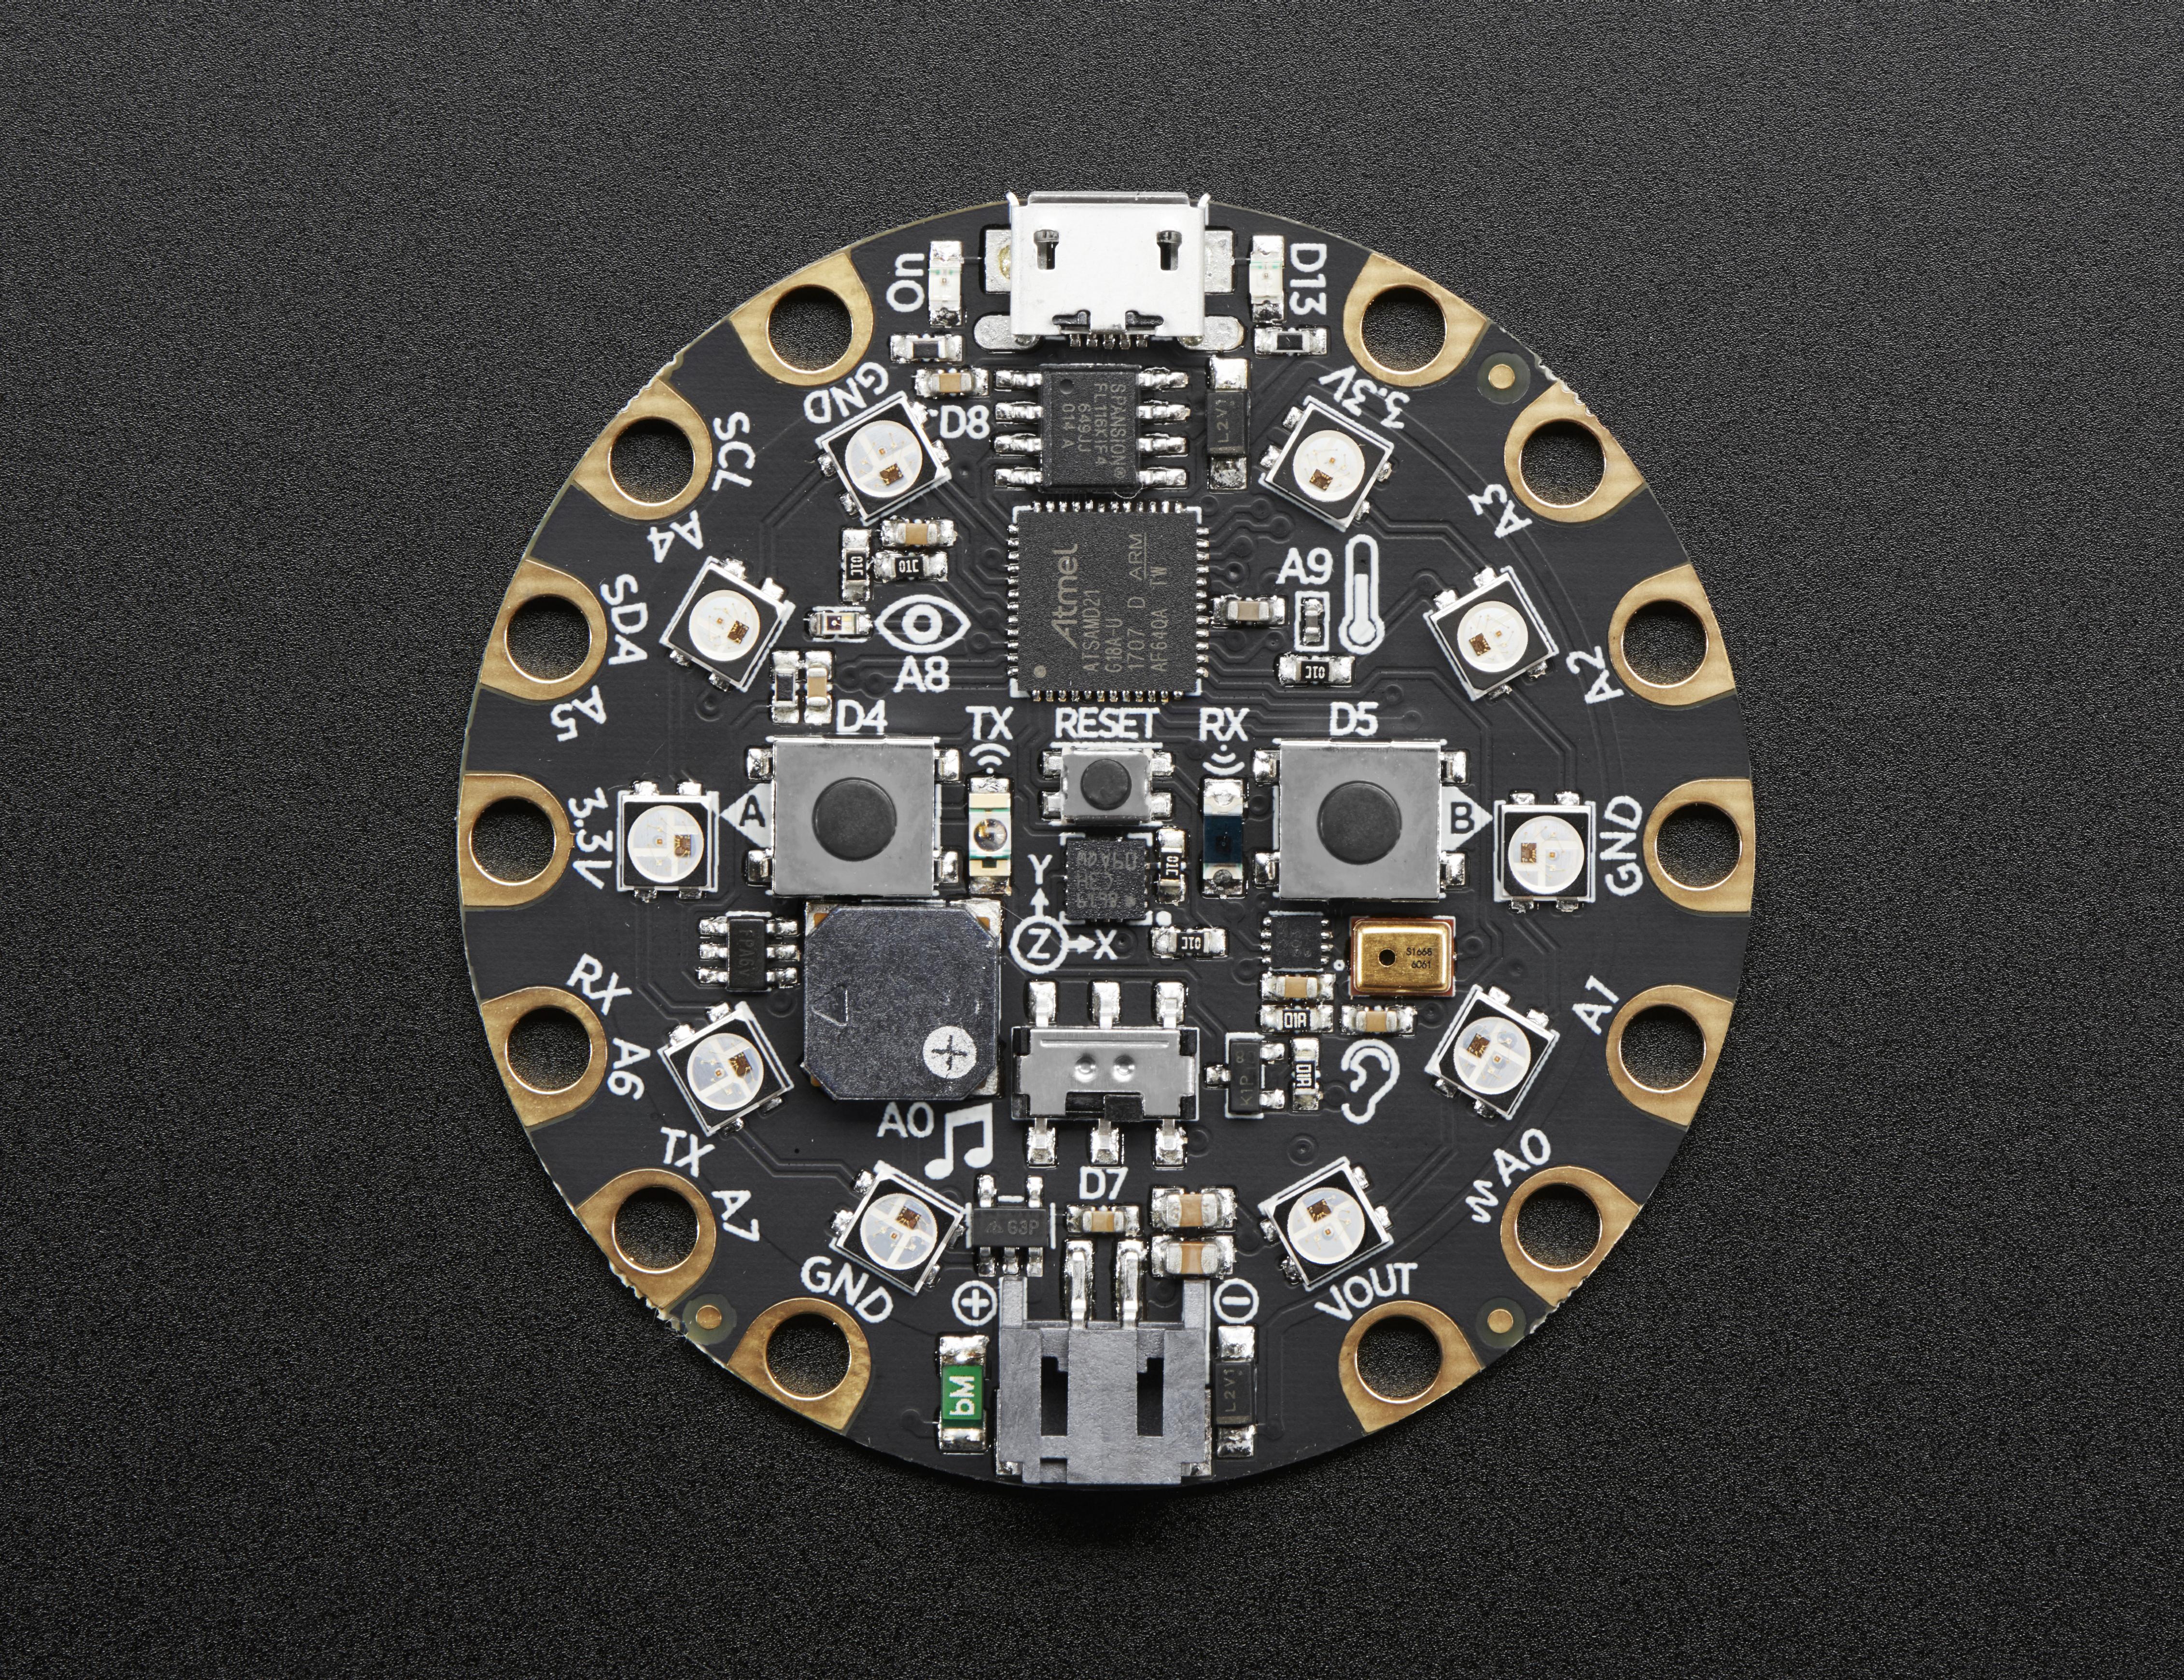 circuit_playground_3333_top_ORIG.jpg